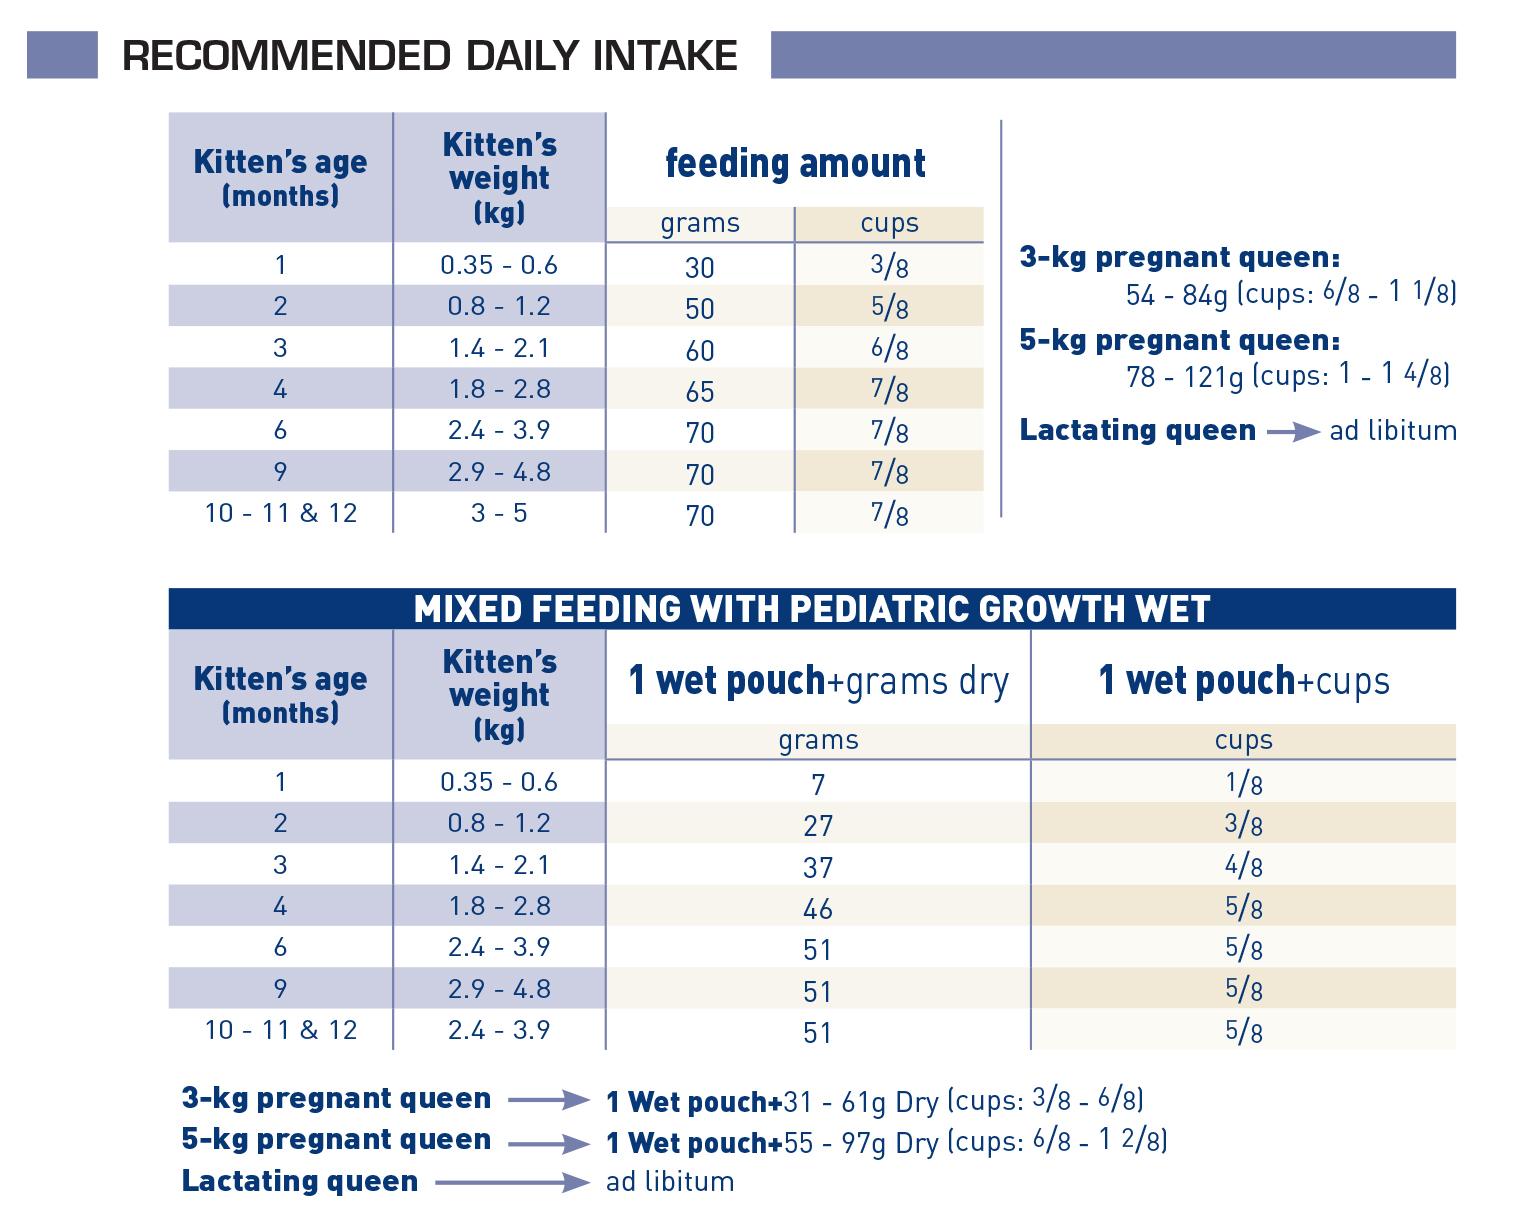 Pediatric Growth